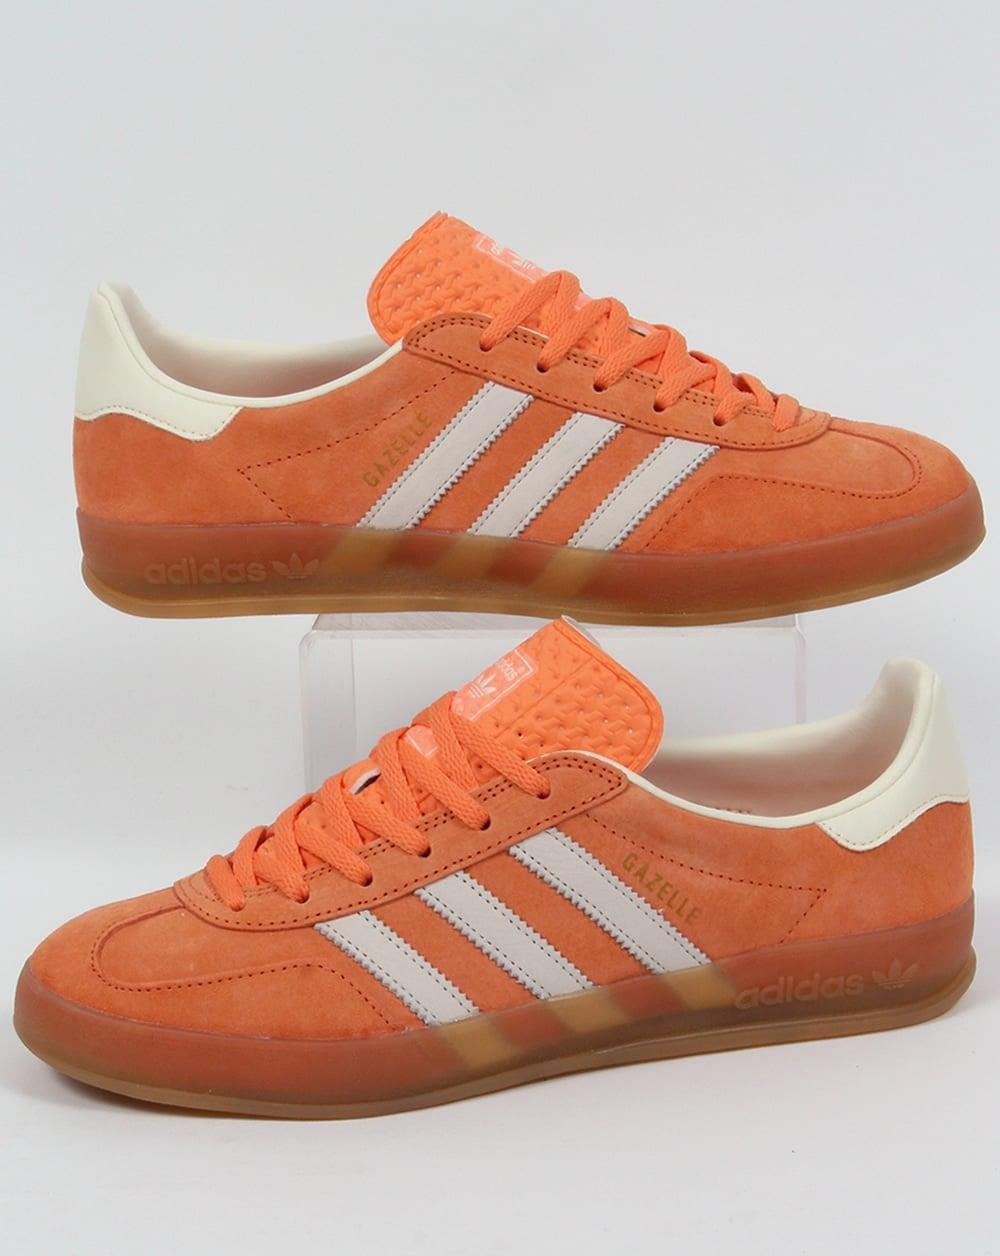 adidas Trainers Adidas Gazelle Indoor Trainers in light orange 184e62bb8